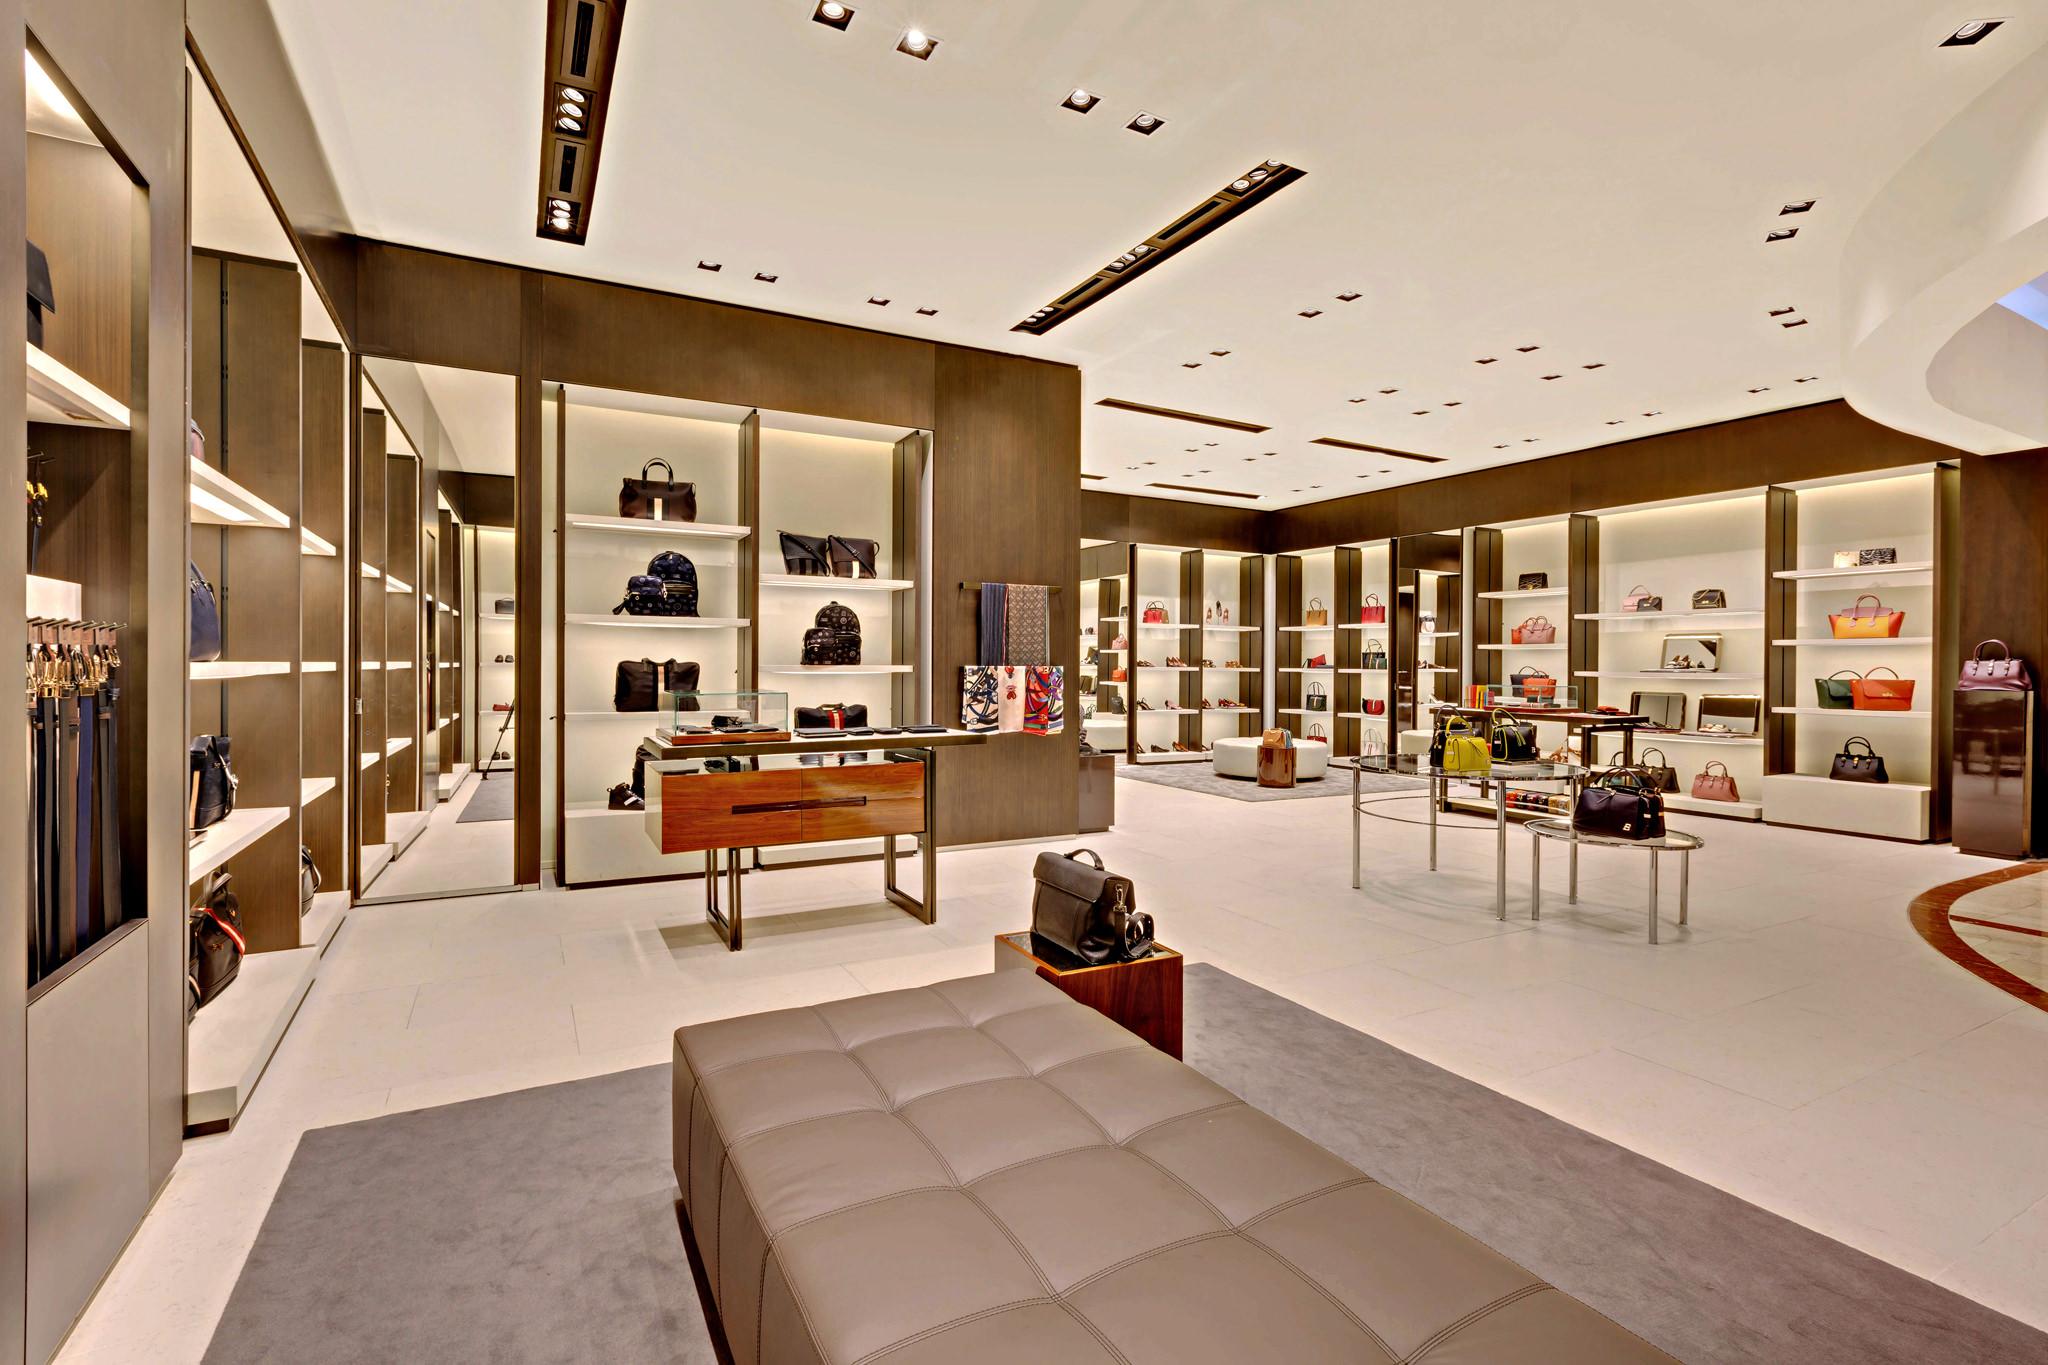 20170721 - Bally - HCM - Commercial - Interior - Store - Retouch 0010.jpg